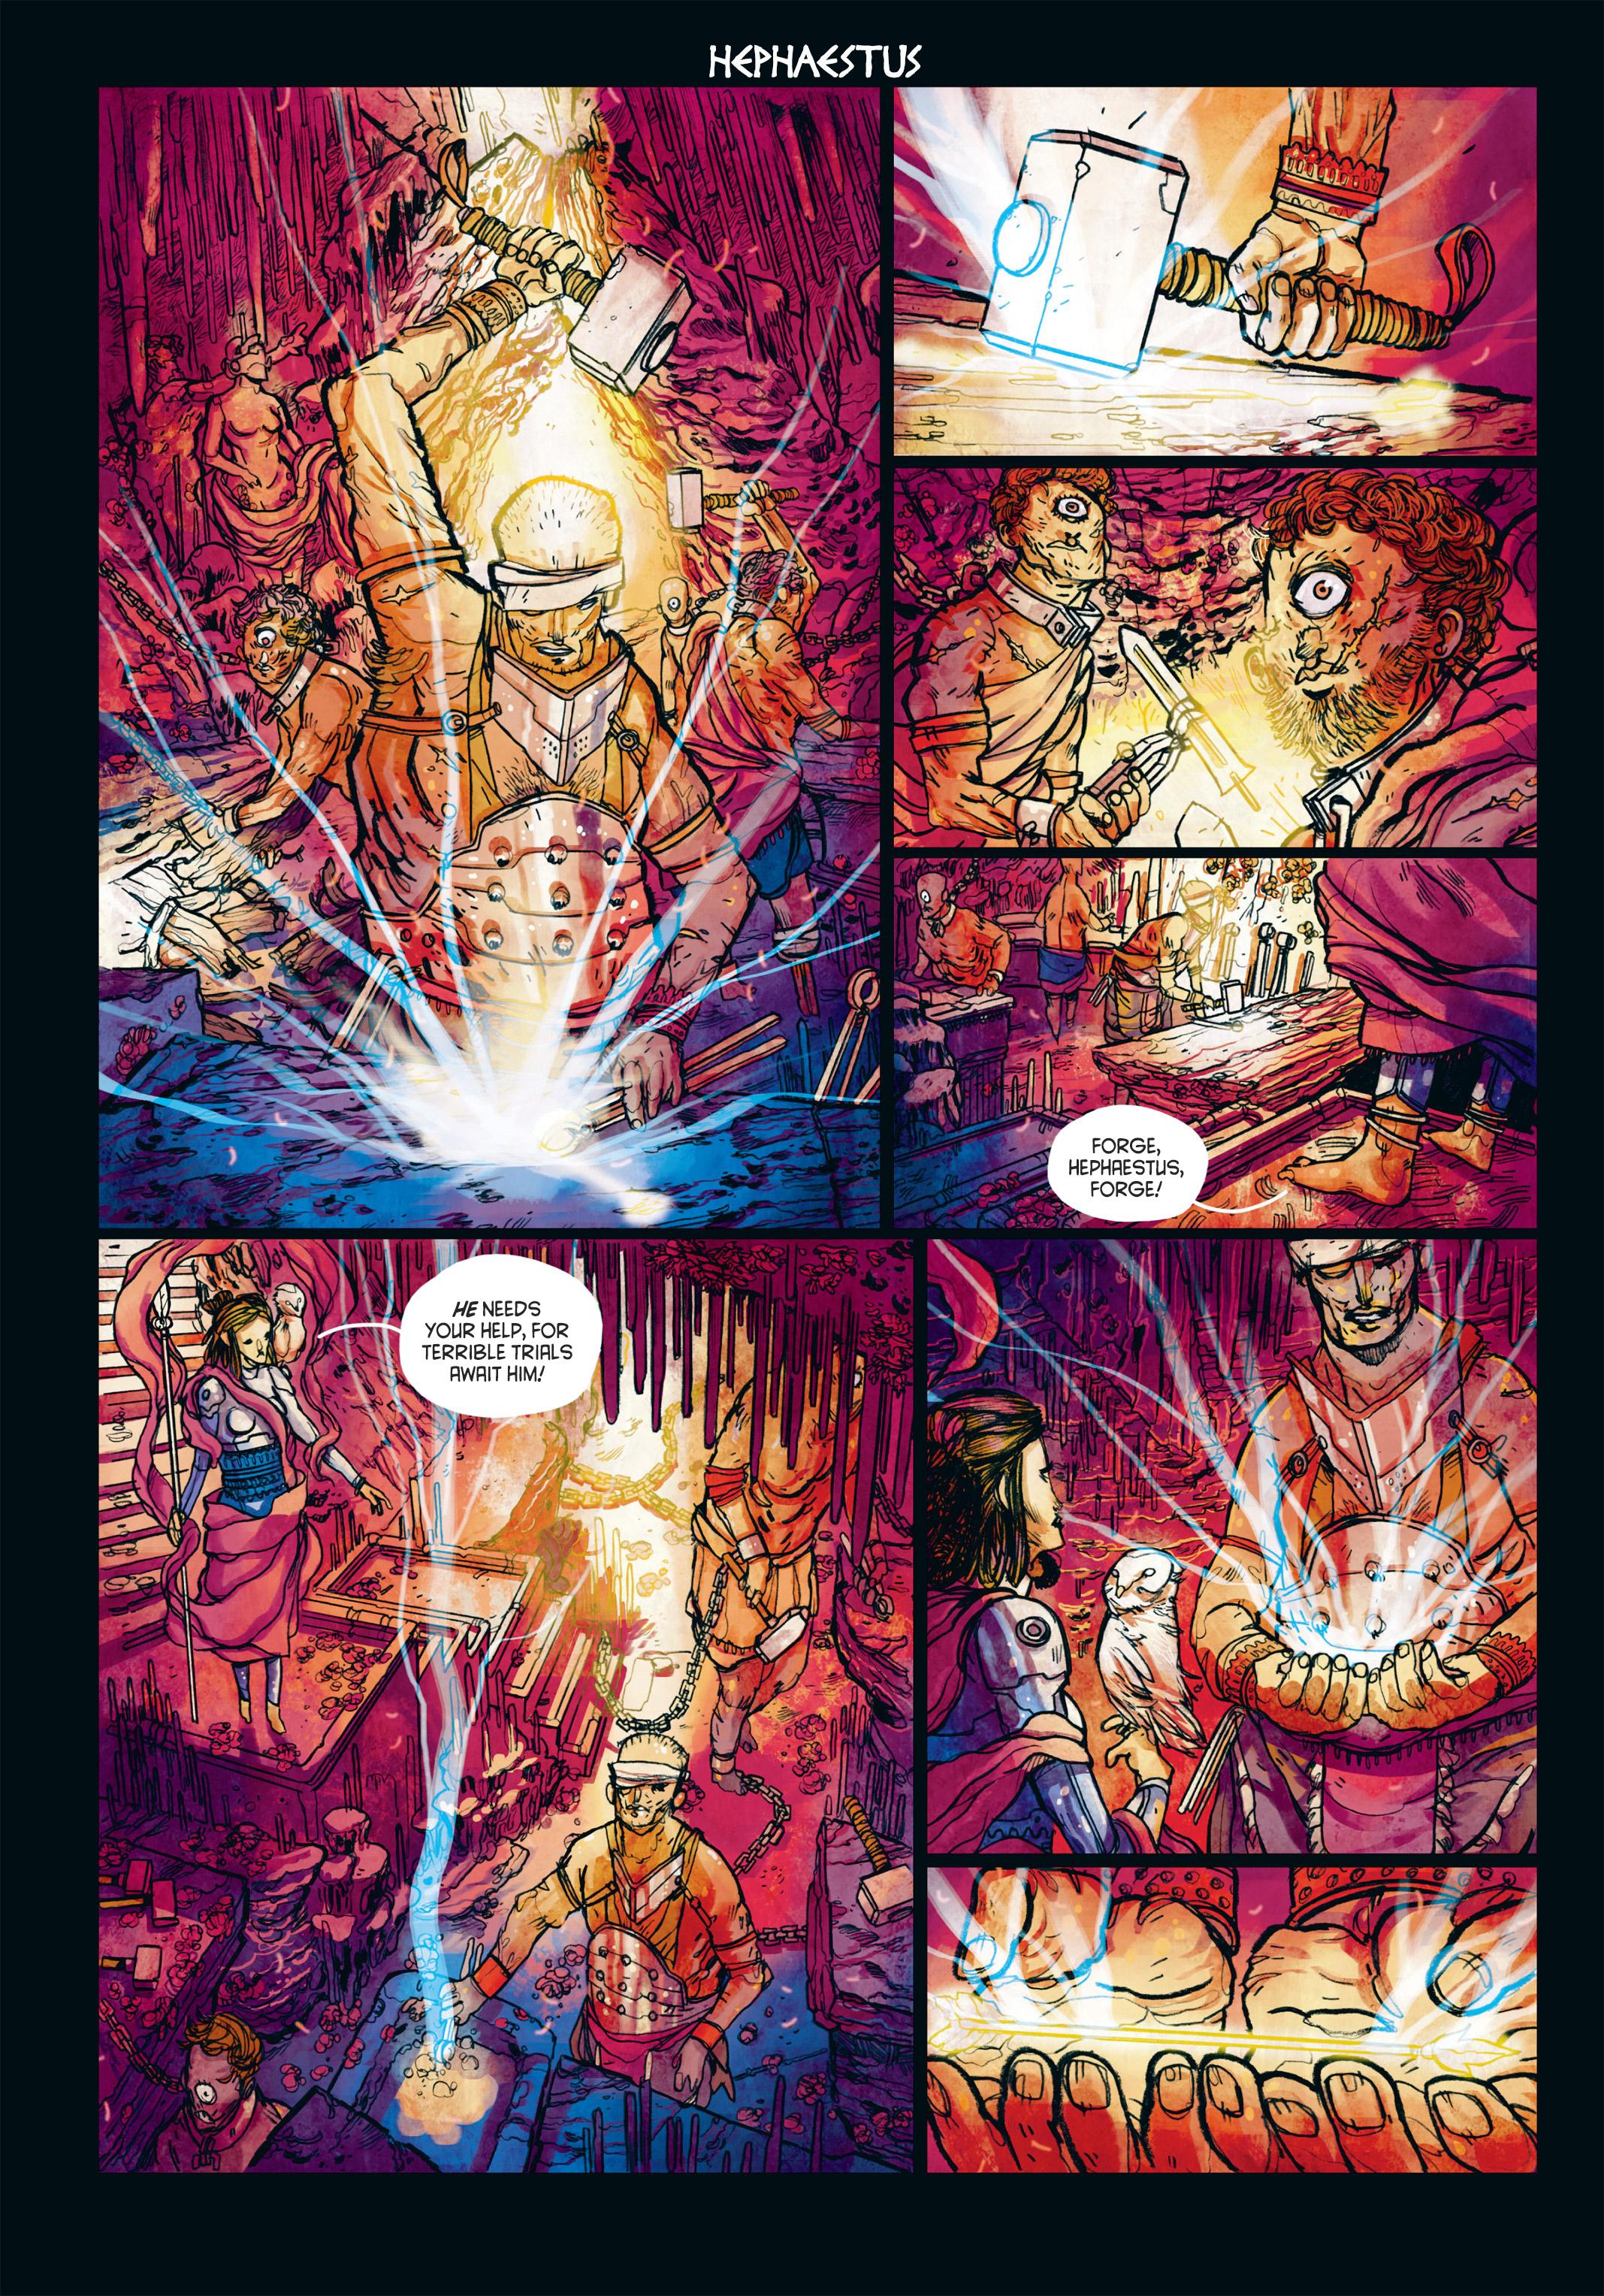 Read online Adrastée comic -  Issue #1 - 38